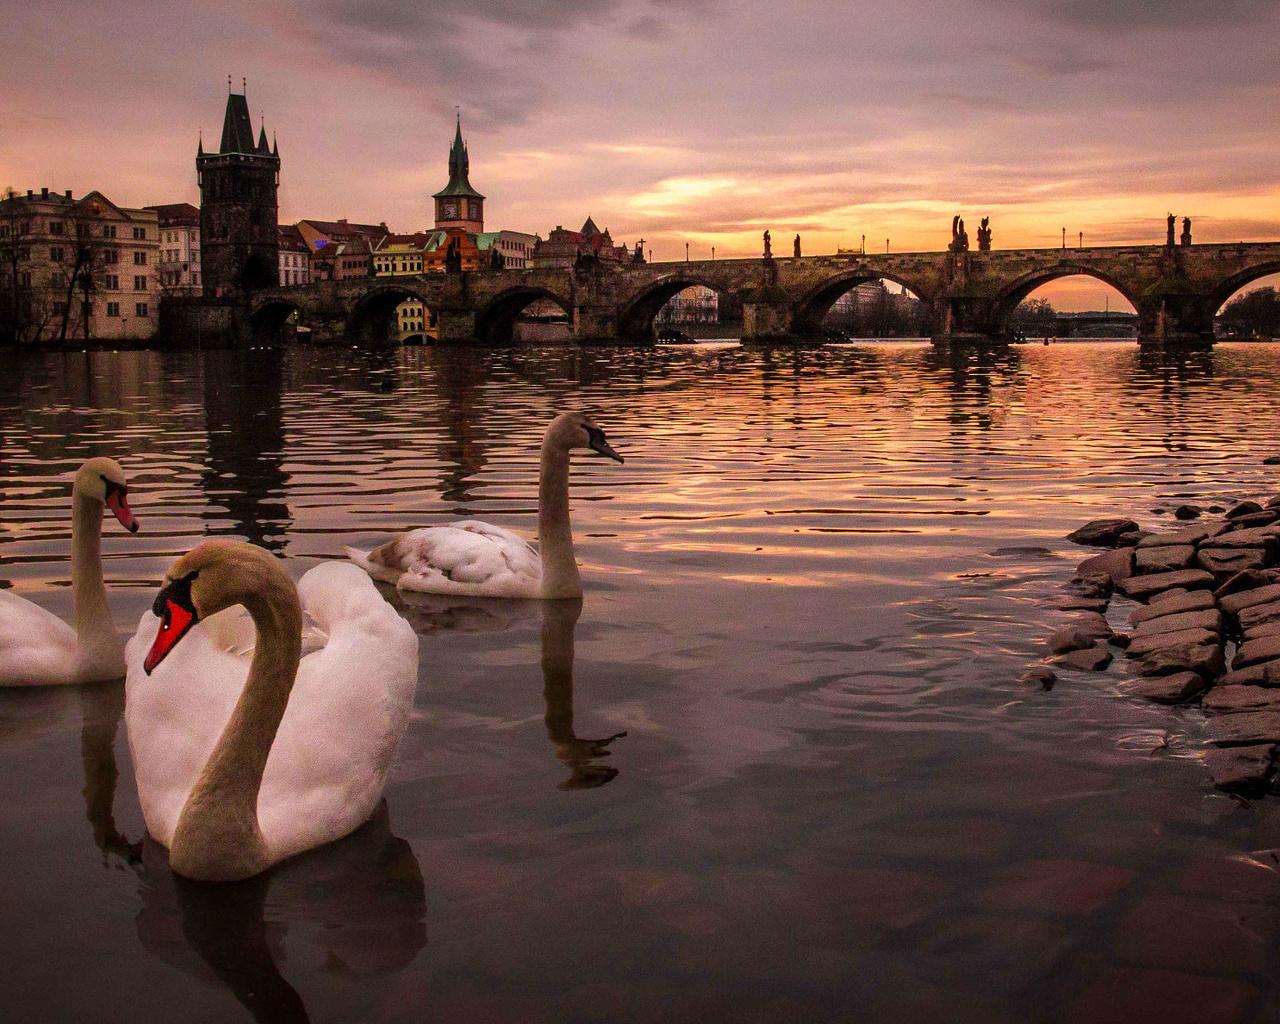 alin dinu, Чехия, город, прага, река, влтава, мост, charles bridge, карлов мост, здания, птицы, лебеди